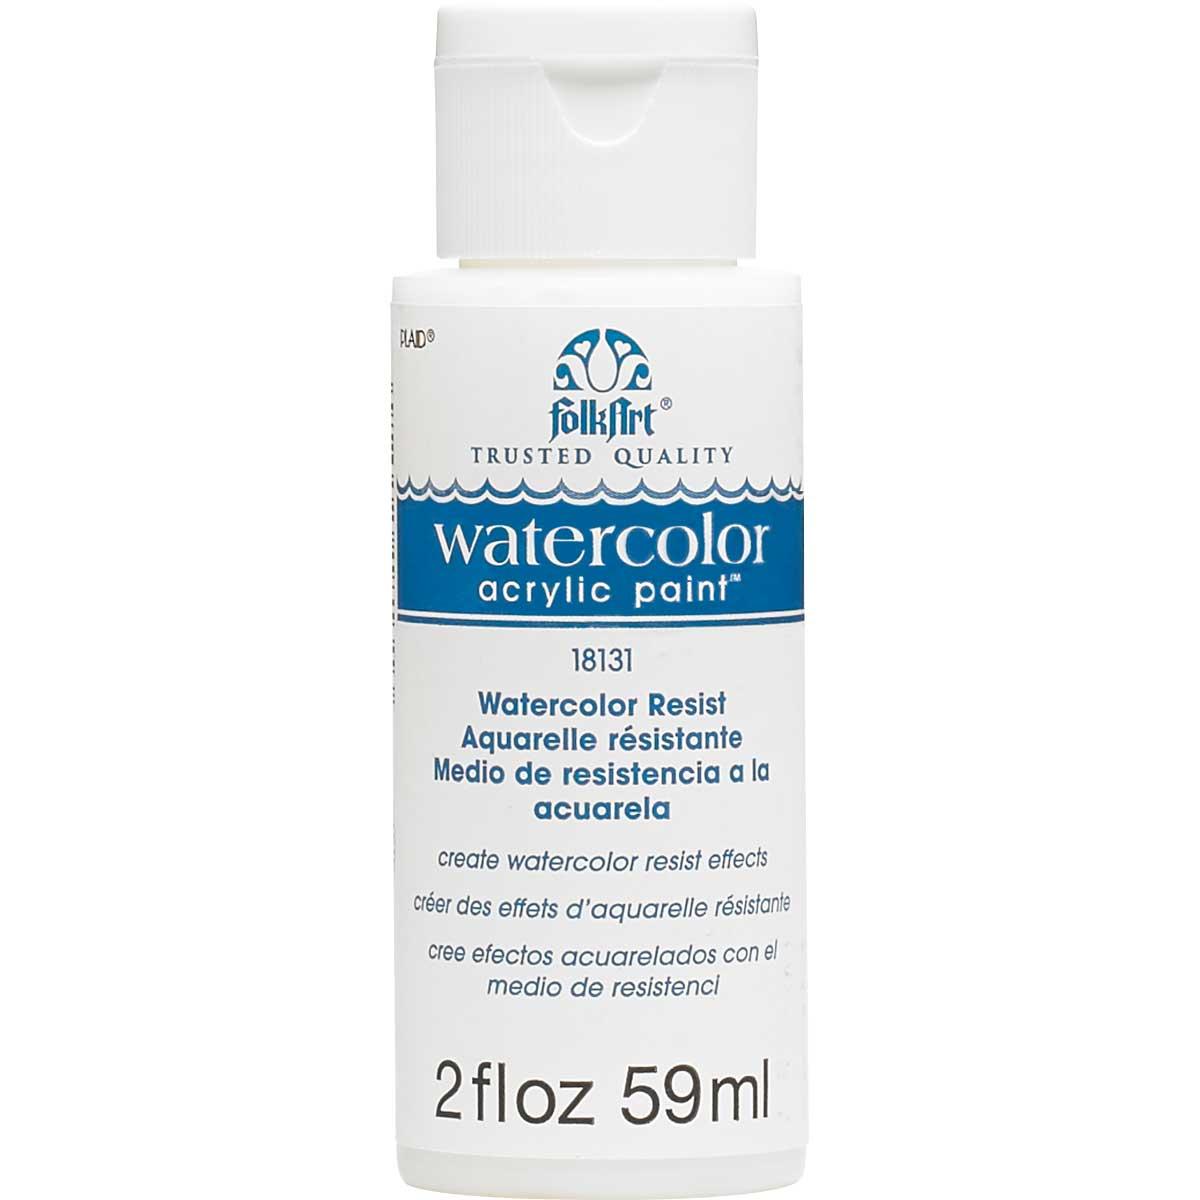 FolkArt ® Watercolor Acrylic Paint™ Resist 2 oz.